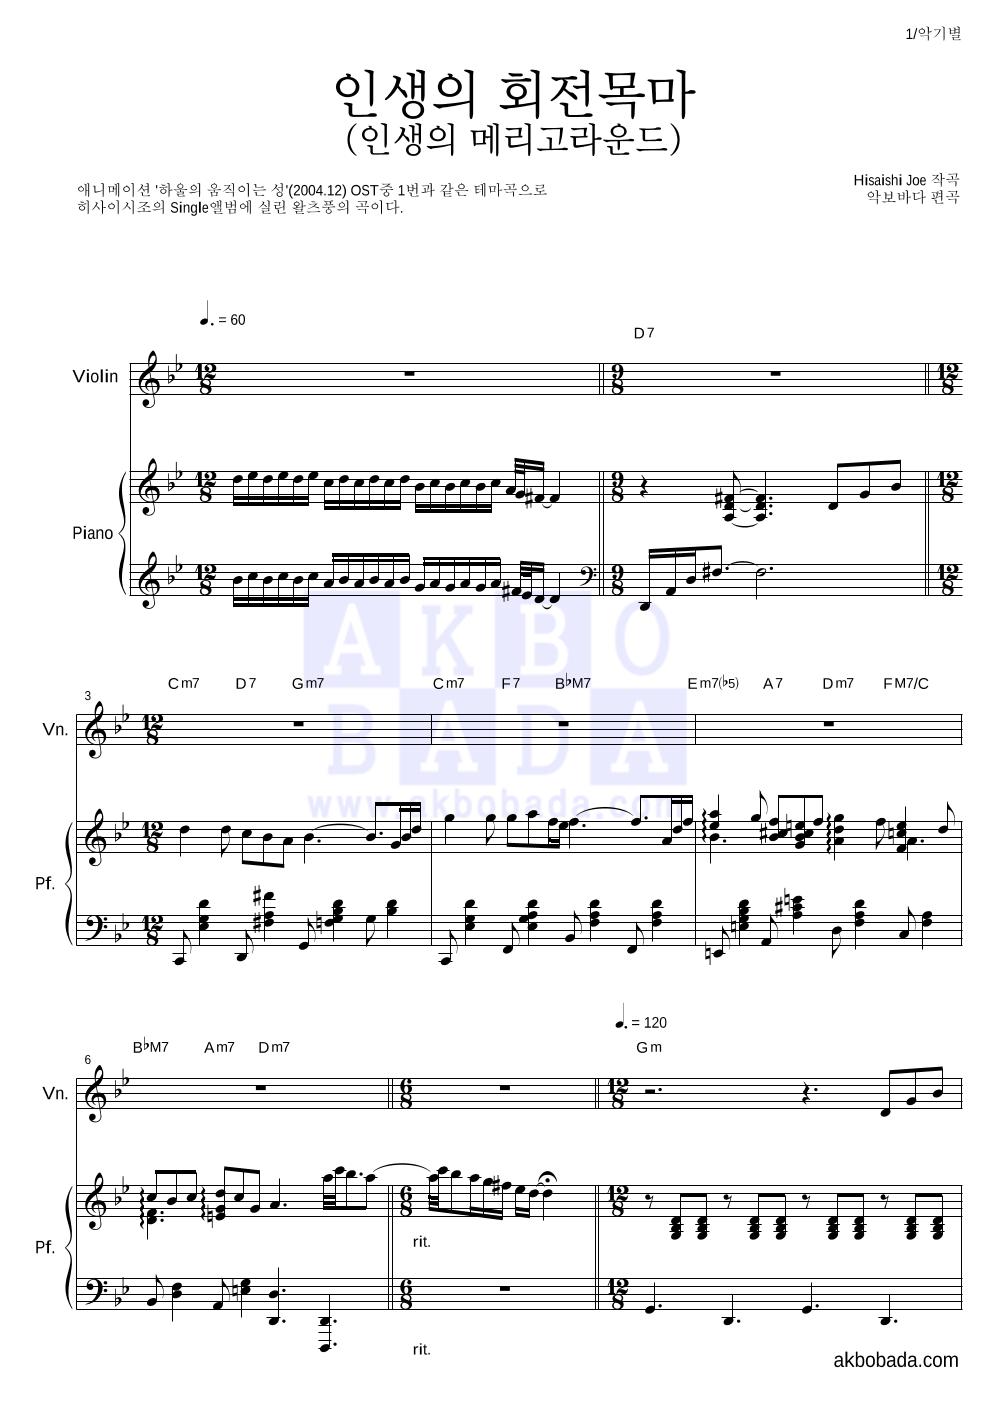 Hisaishi Joe - 인생의 회전목마 바이올린&피아노 악보